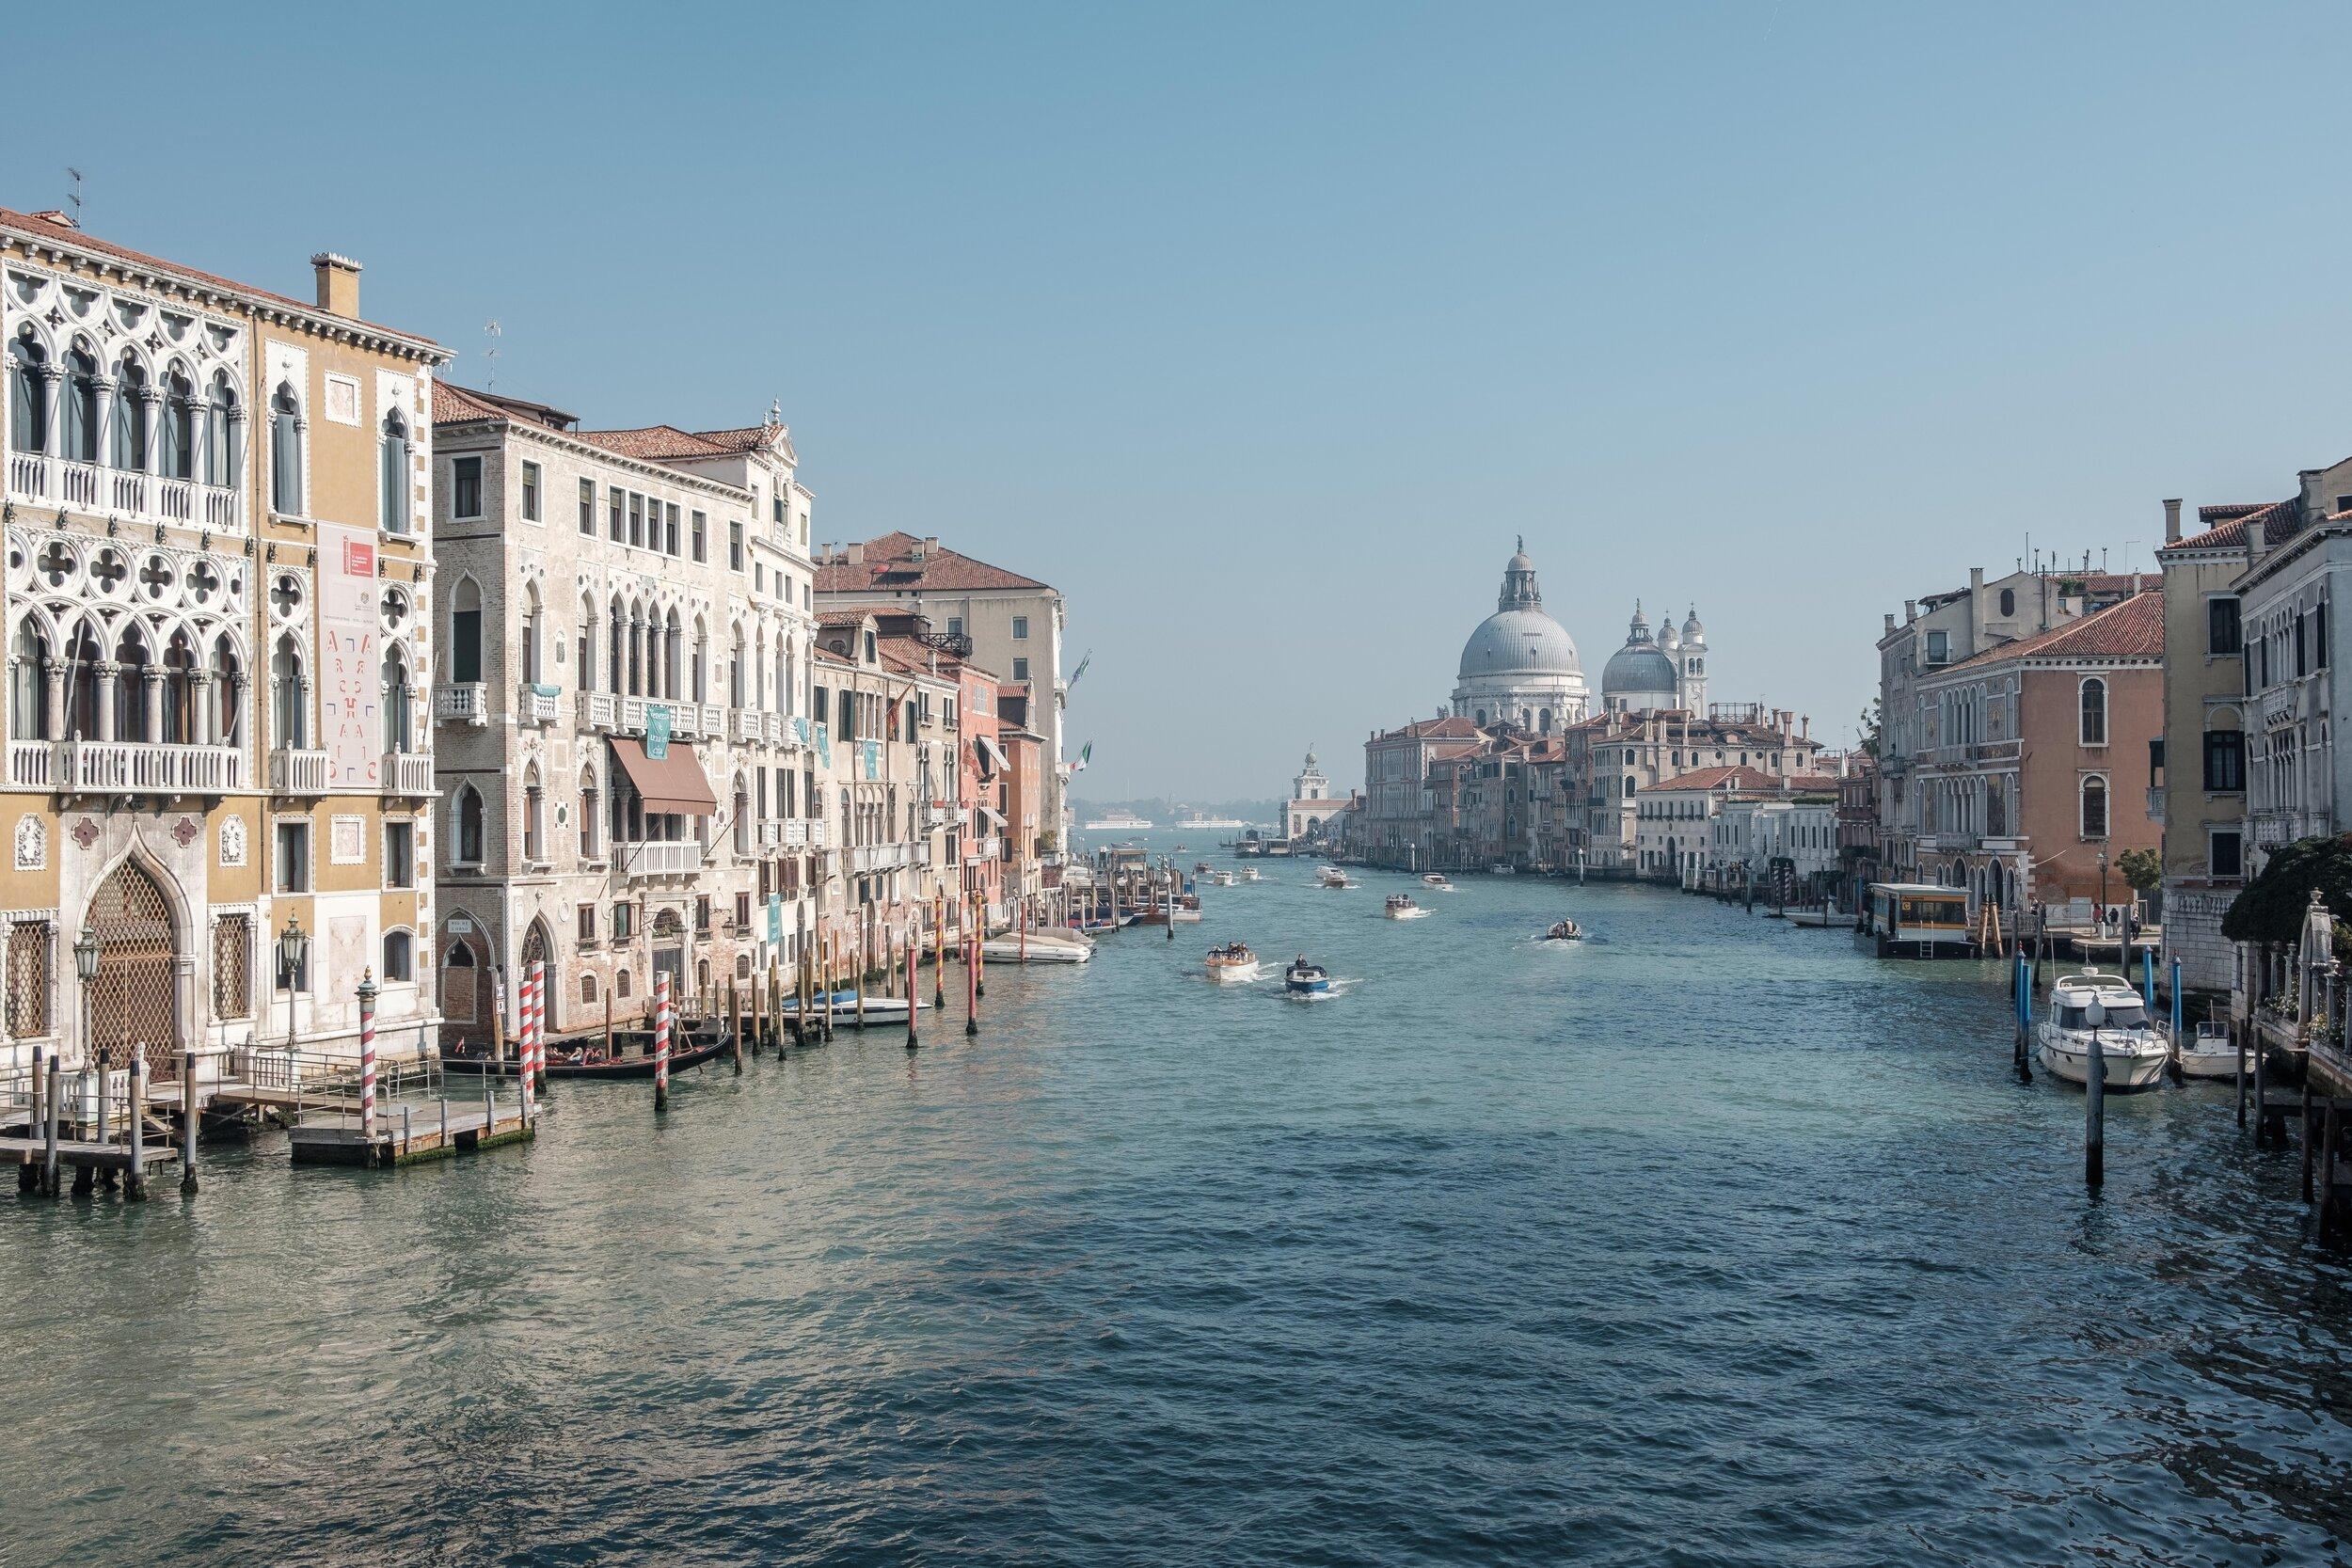 Photo: Christian Holzinger / Ponte dell'Accademia, Venezia, Italy